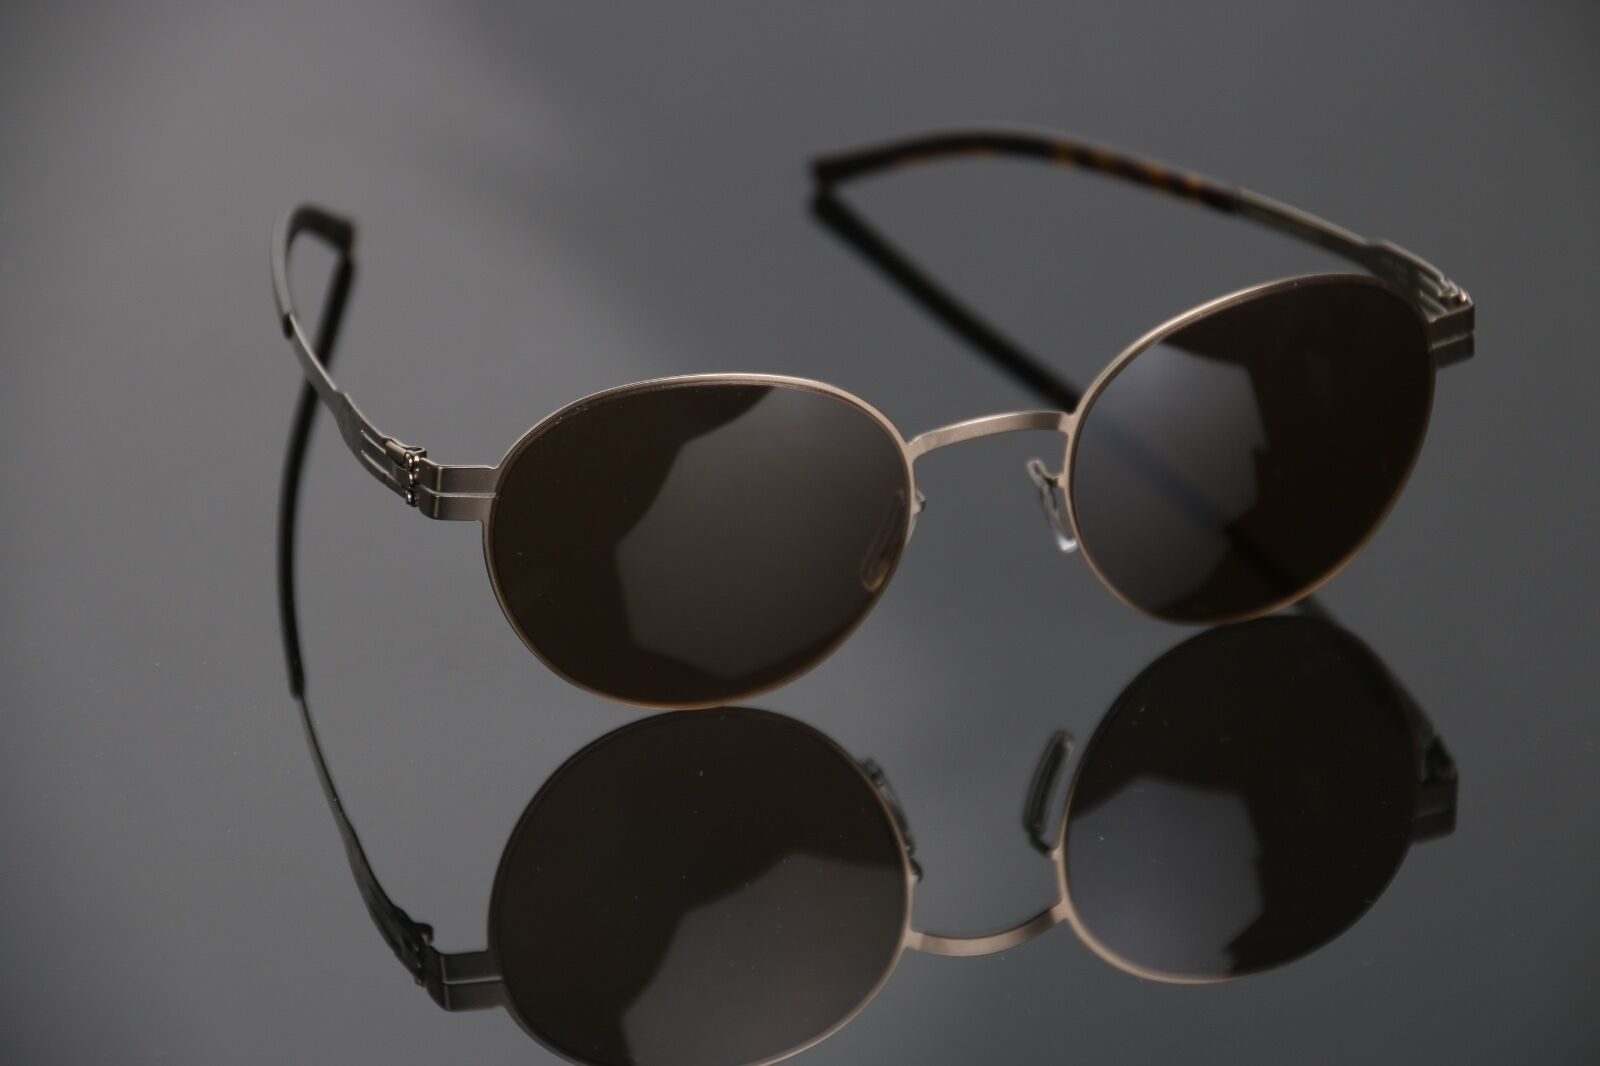 85e9662513 IC Berlin M1237 Claude Sunglasses Bronze Havana Matte With Brown ...